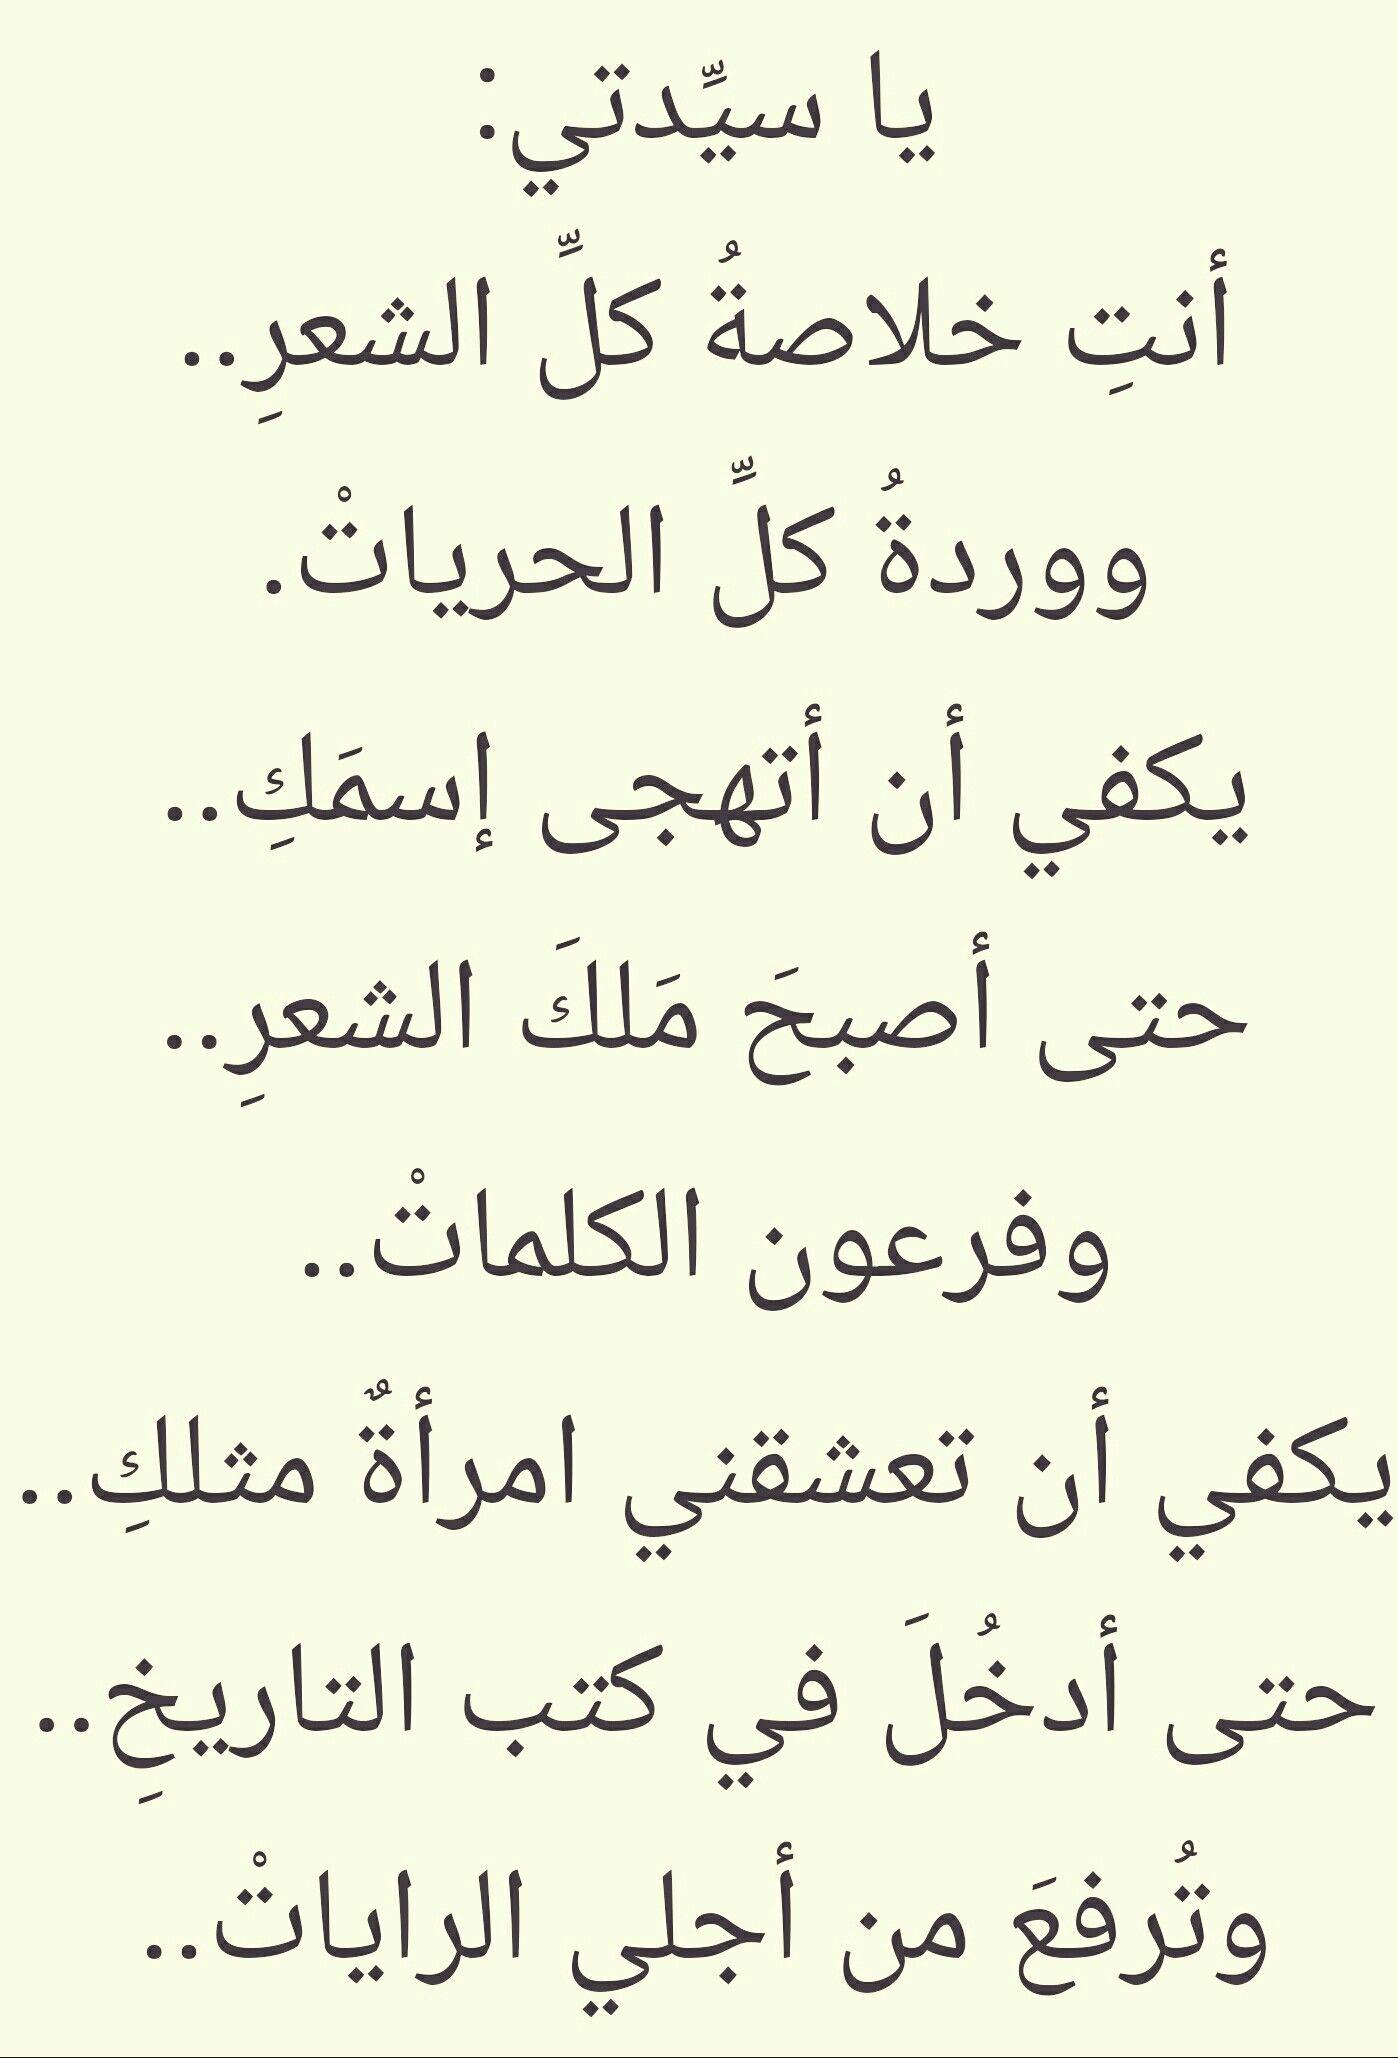 نزار قباني من قصيدة حب بلا حدود Arabic Words Arabic Poetry Magic Words